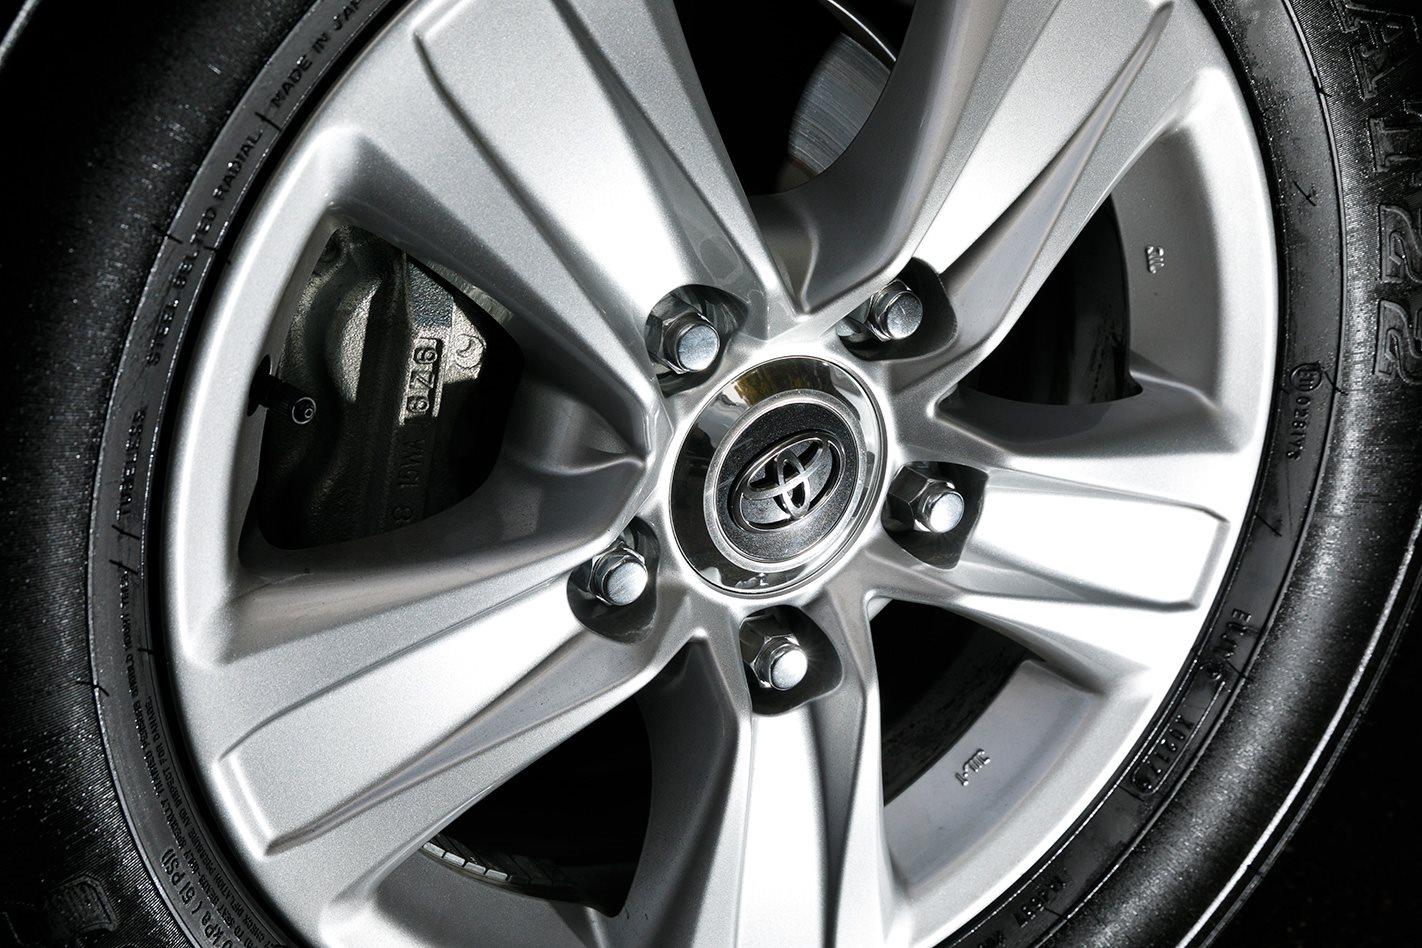 2017 Toyota LandCruiser 200 Series wheel.jpg